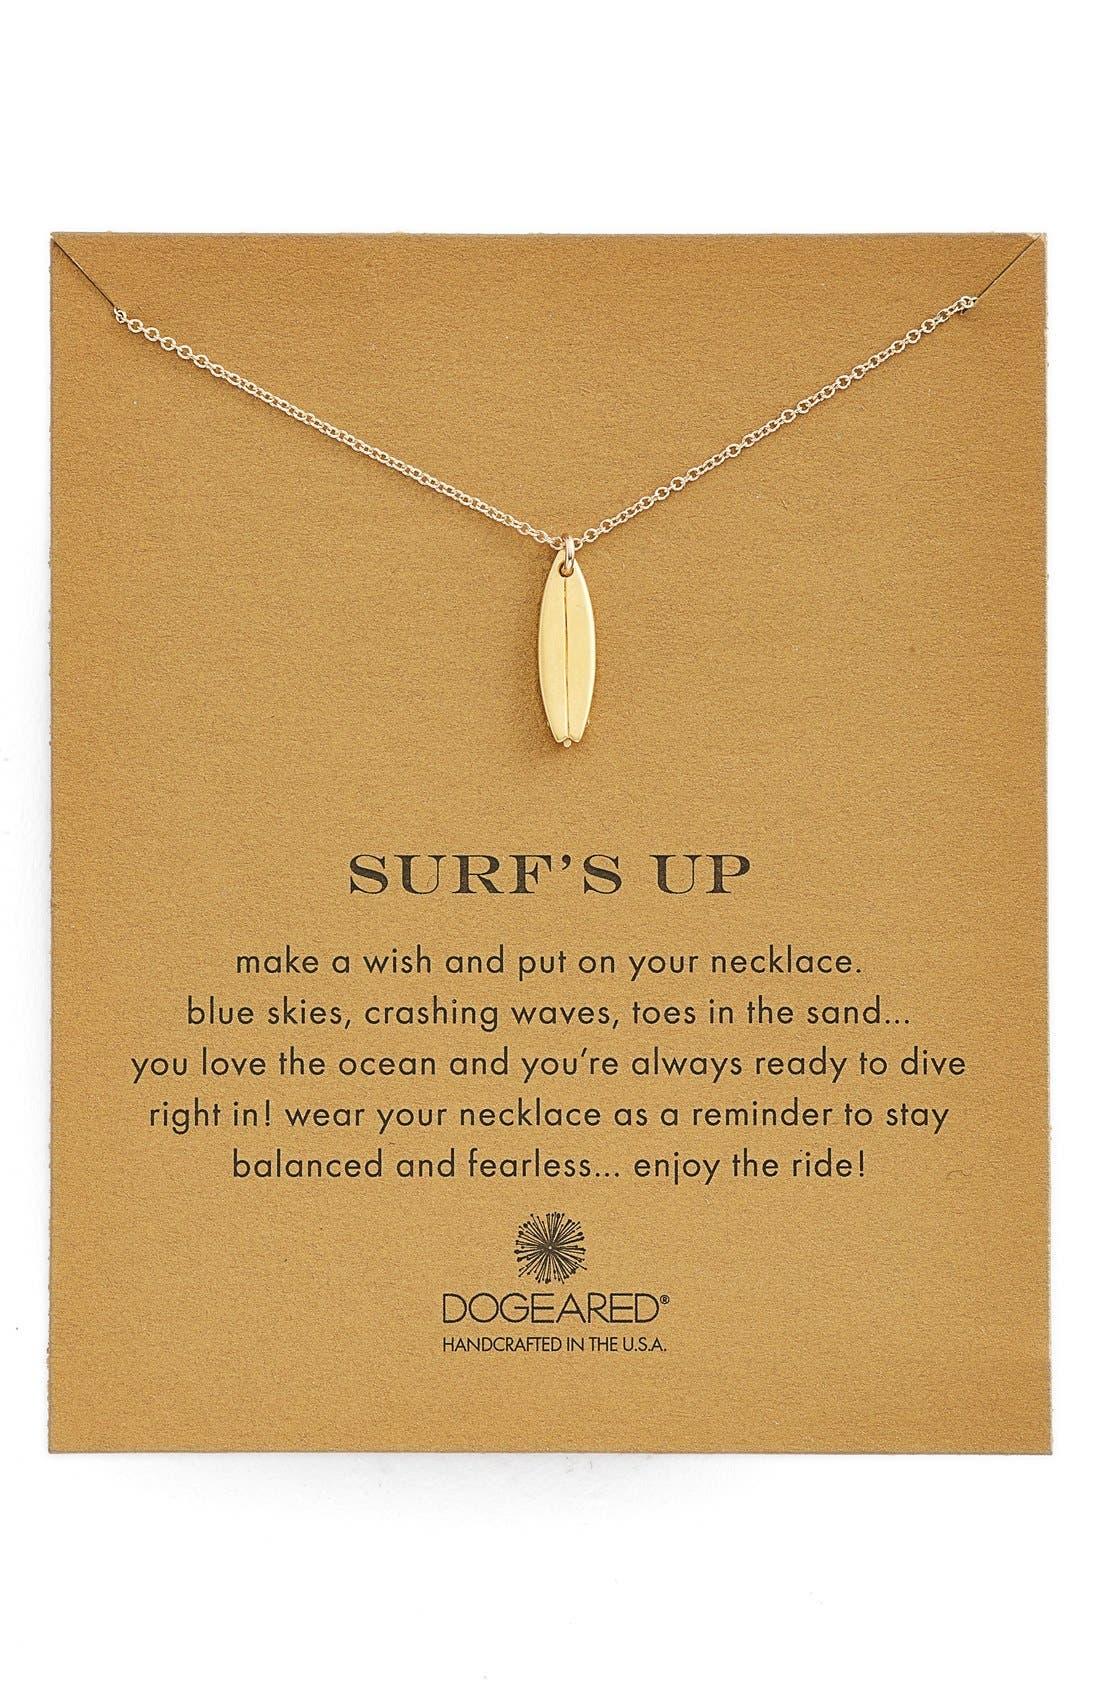 Alternate Image 1 Selected - Dogeared 'Reminder - Surf's Up' Surfboard Pendant Necklace